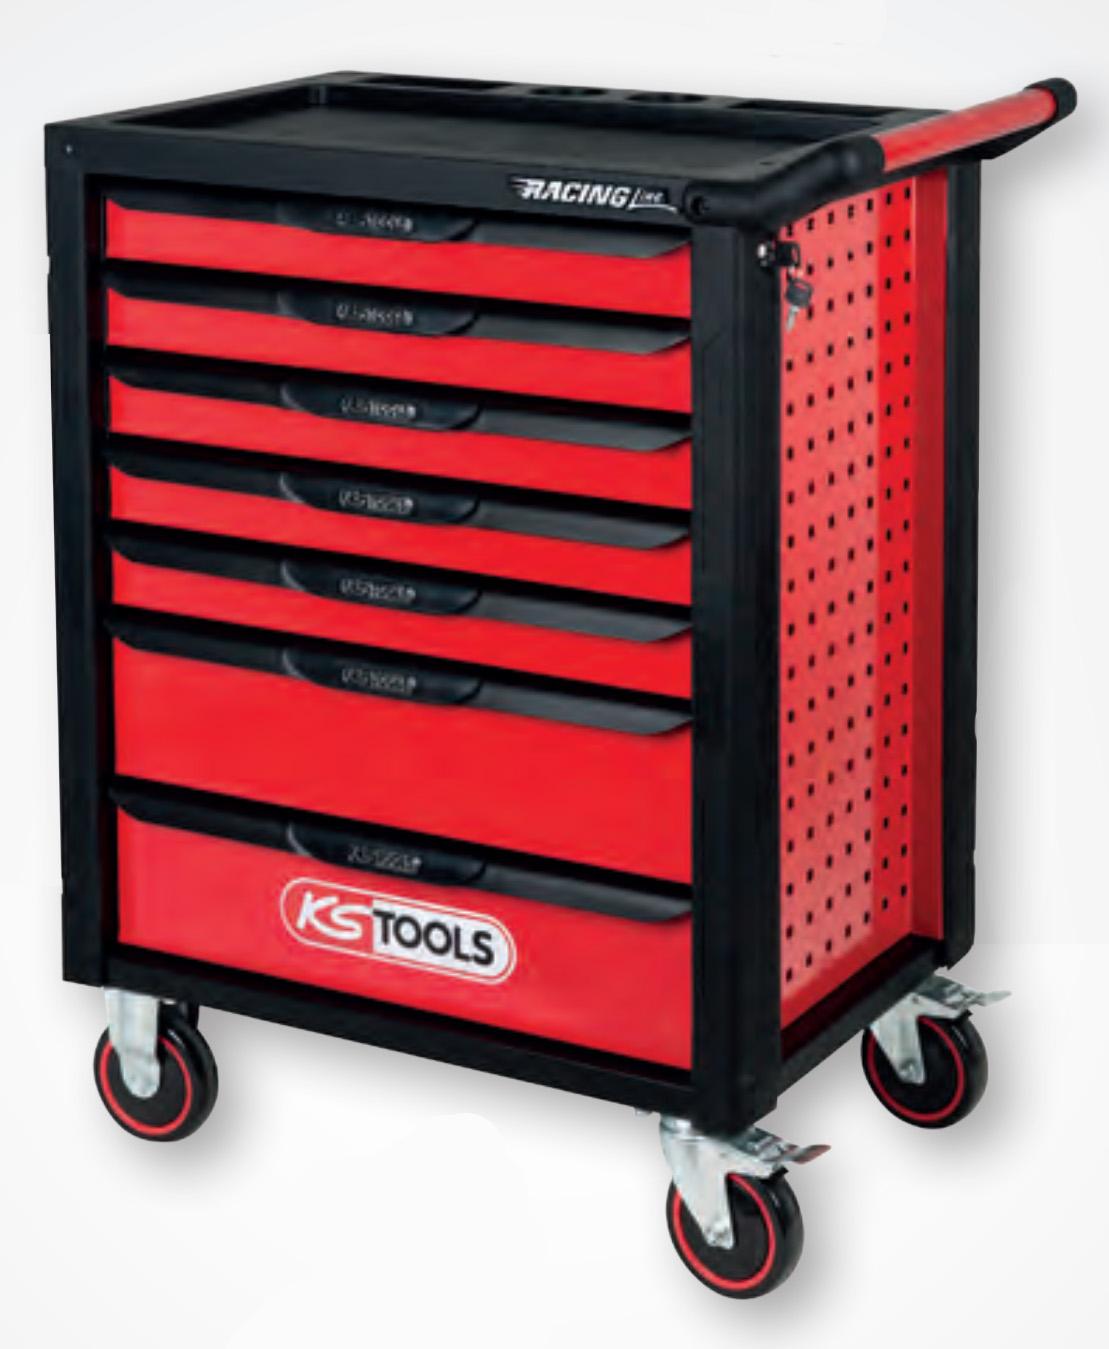 kolica za alat racing line 7 fioka ks tools prodaja alata. Black Bedroom Furniture Sets. Home Design Ideas